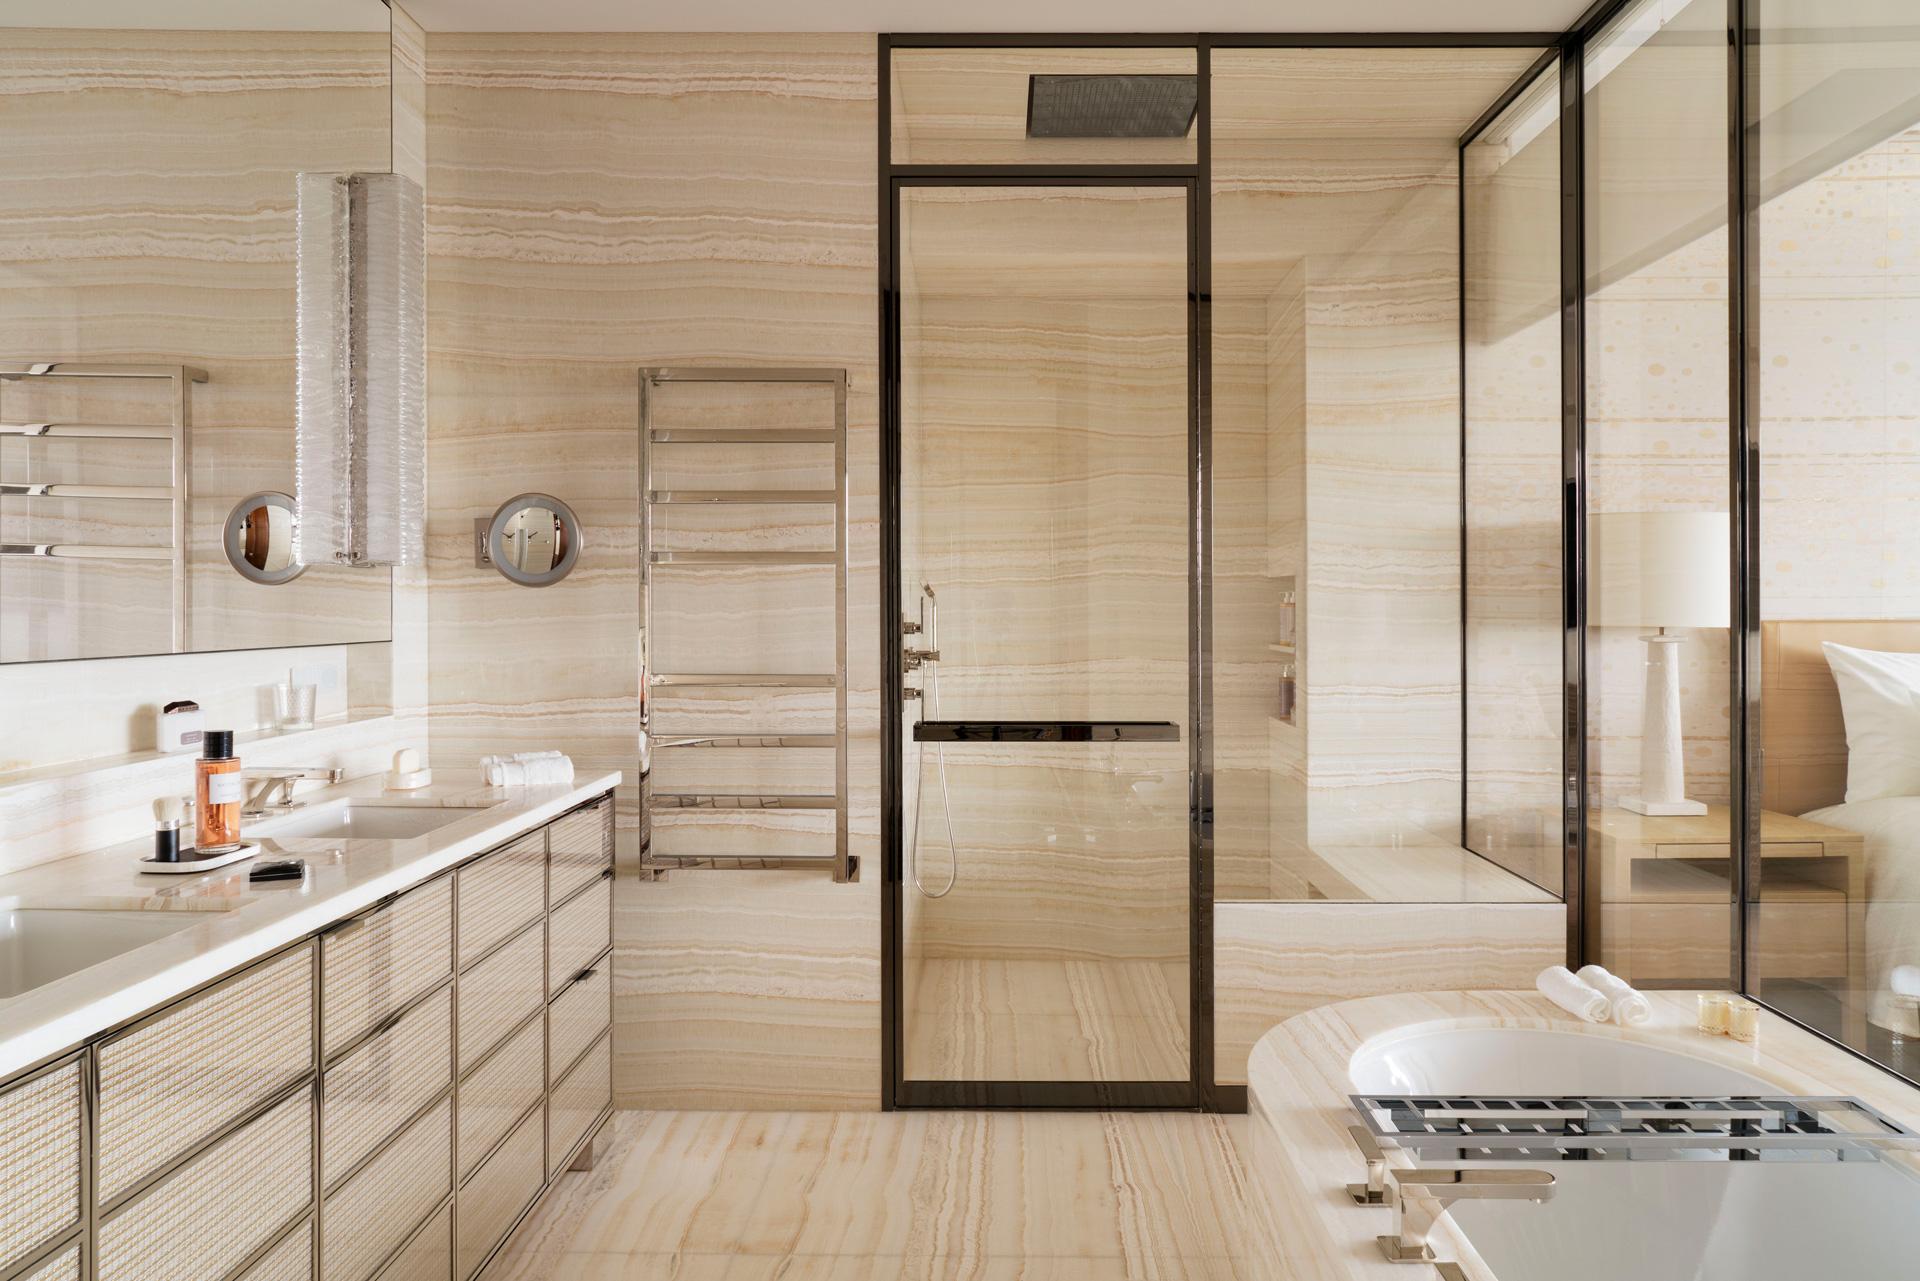 Cheval Blanc Paris, Luxury Hotel France, Suite Seine, Casol